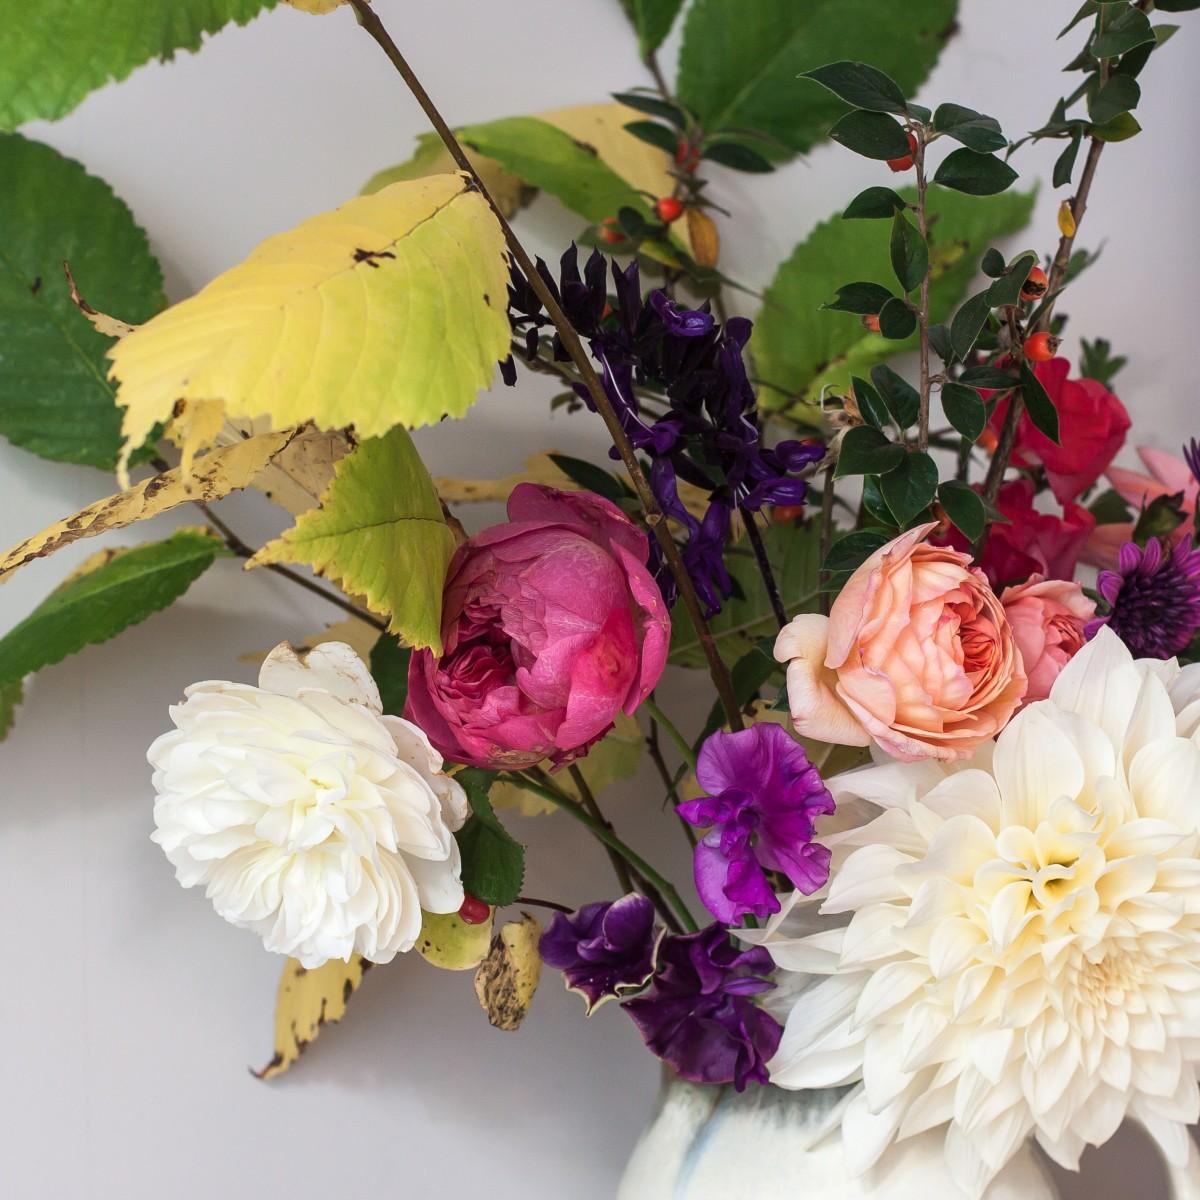 Autumn's Last Hurrah